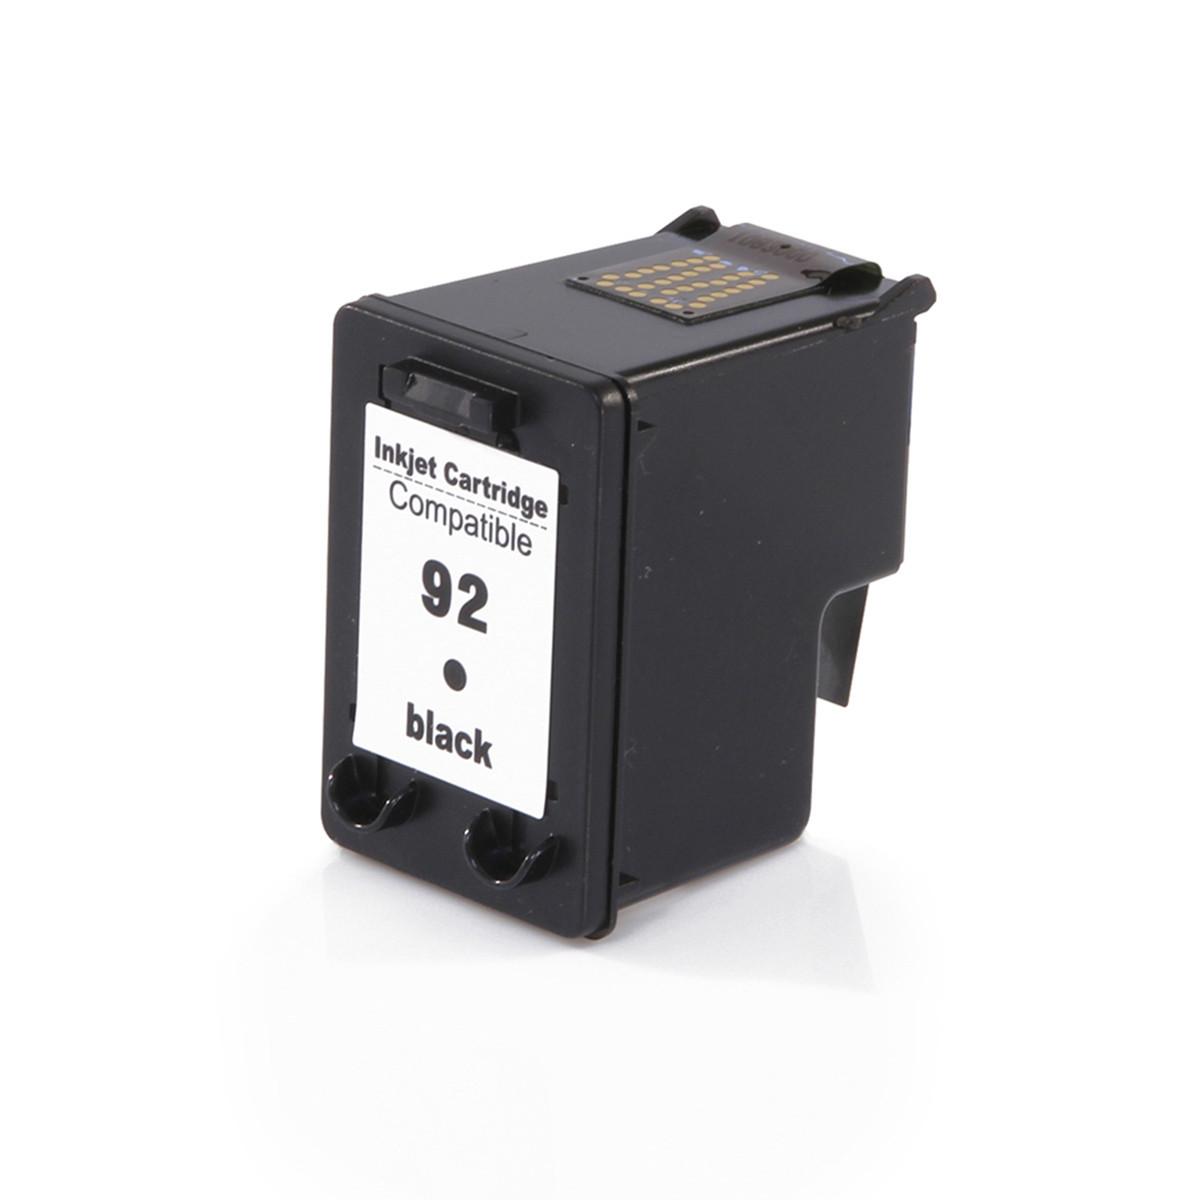 Cartucho de Tinta Compatível com HP 92 C9362WB Preto | D4100 6210 2570 PSC-1507 8ml